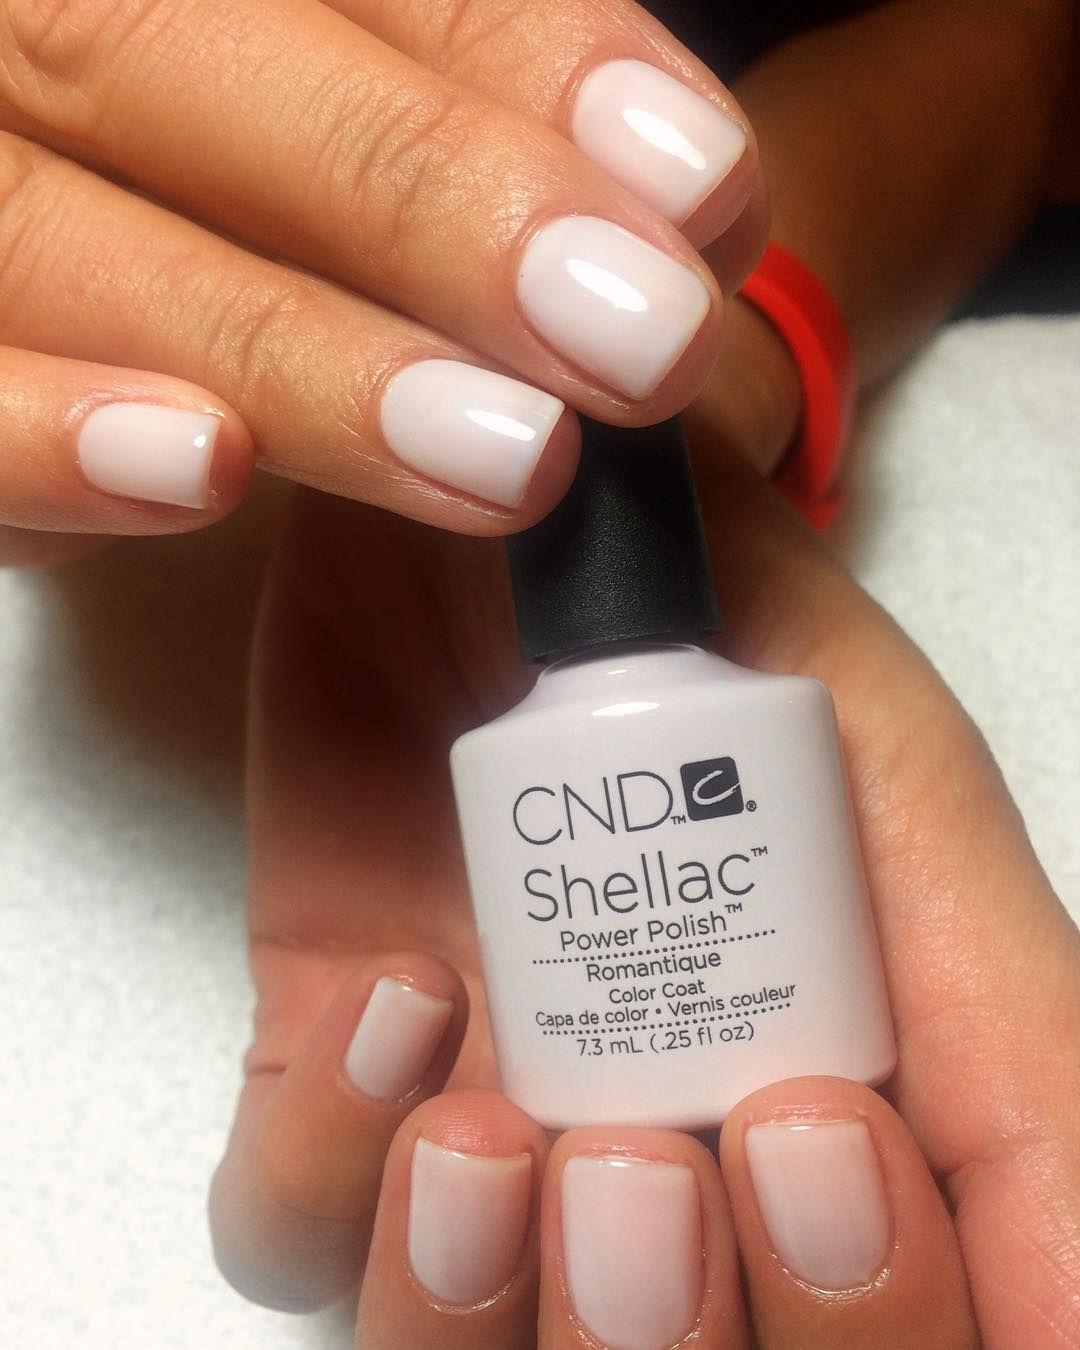 Cnd Shellac Romantique Shellacromantique Shellac Nail Designs Cnd Shellac Nails Cnd Nails